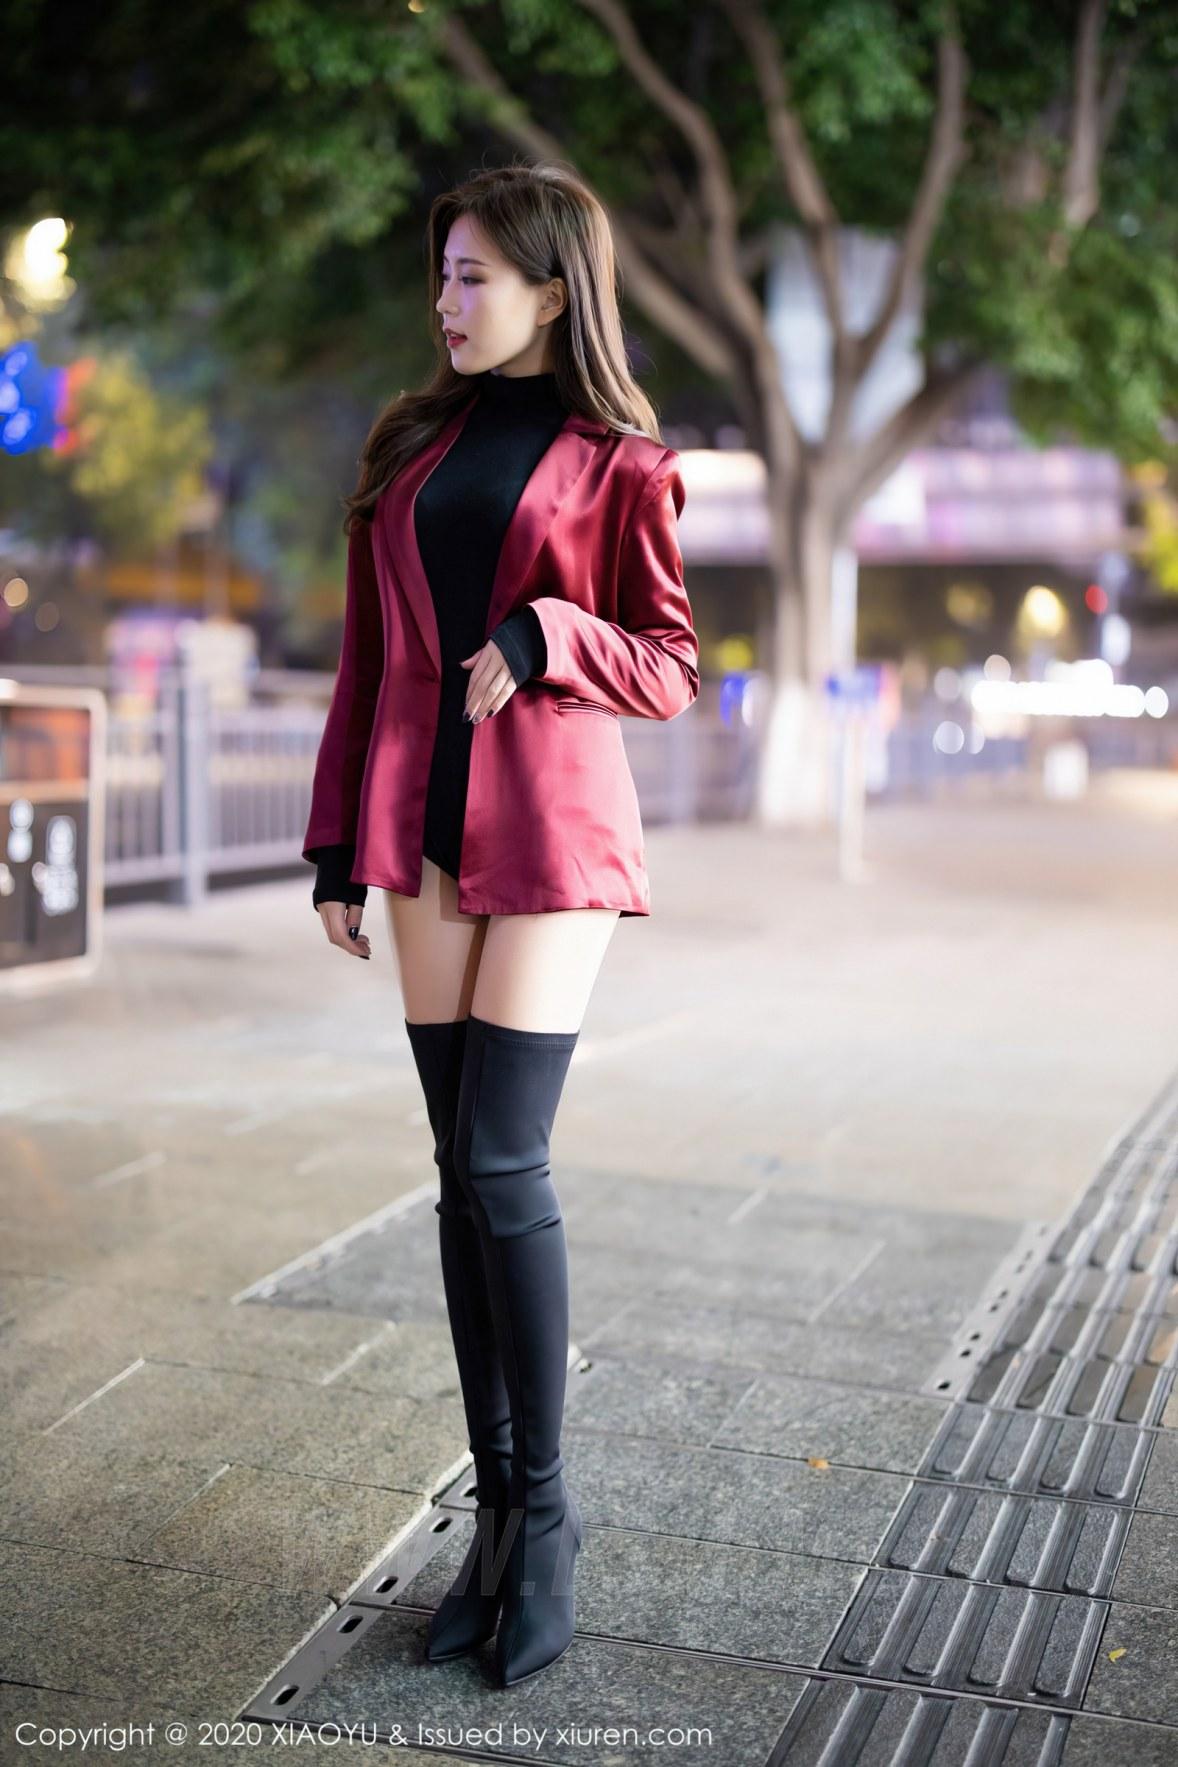 XIAOYU 语画界 Vol.415 时尚街拍魅惑私房 杨紫嫣 - 4